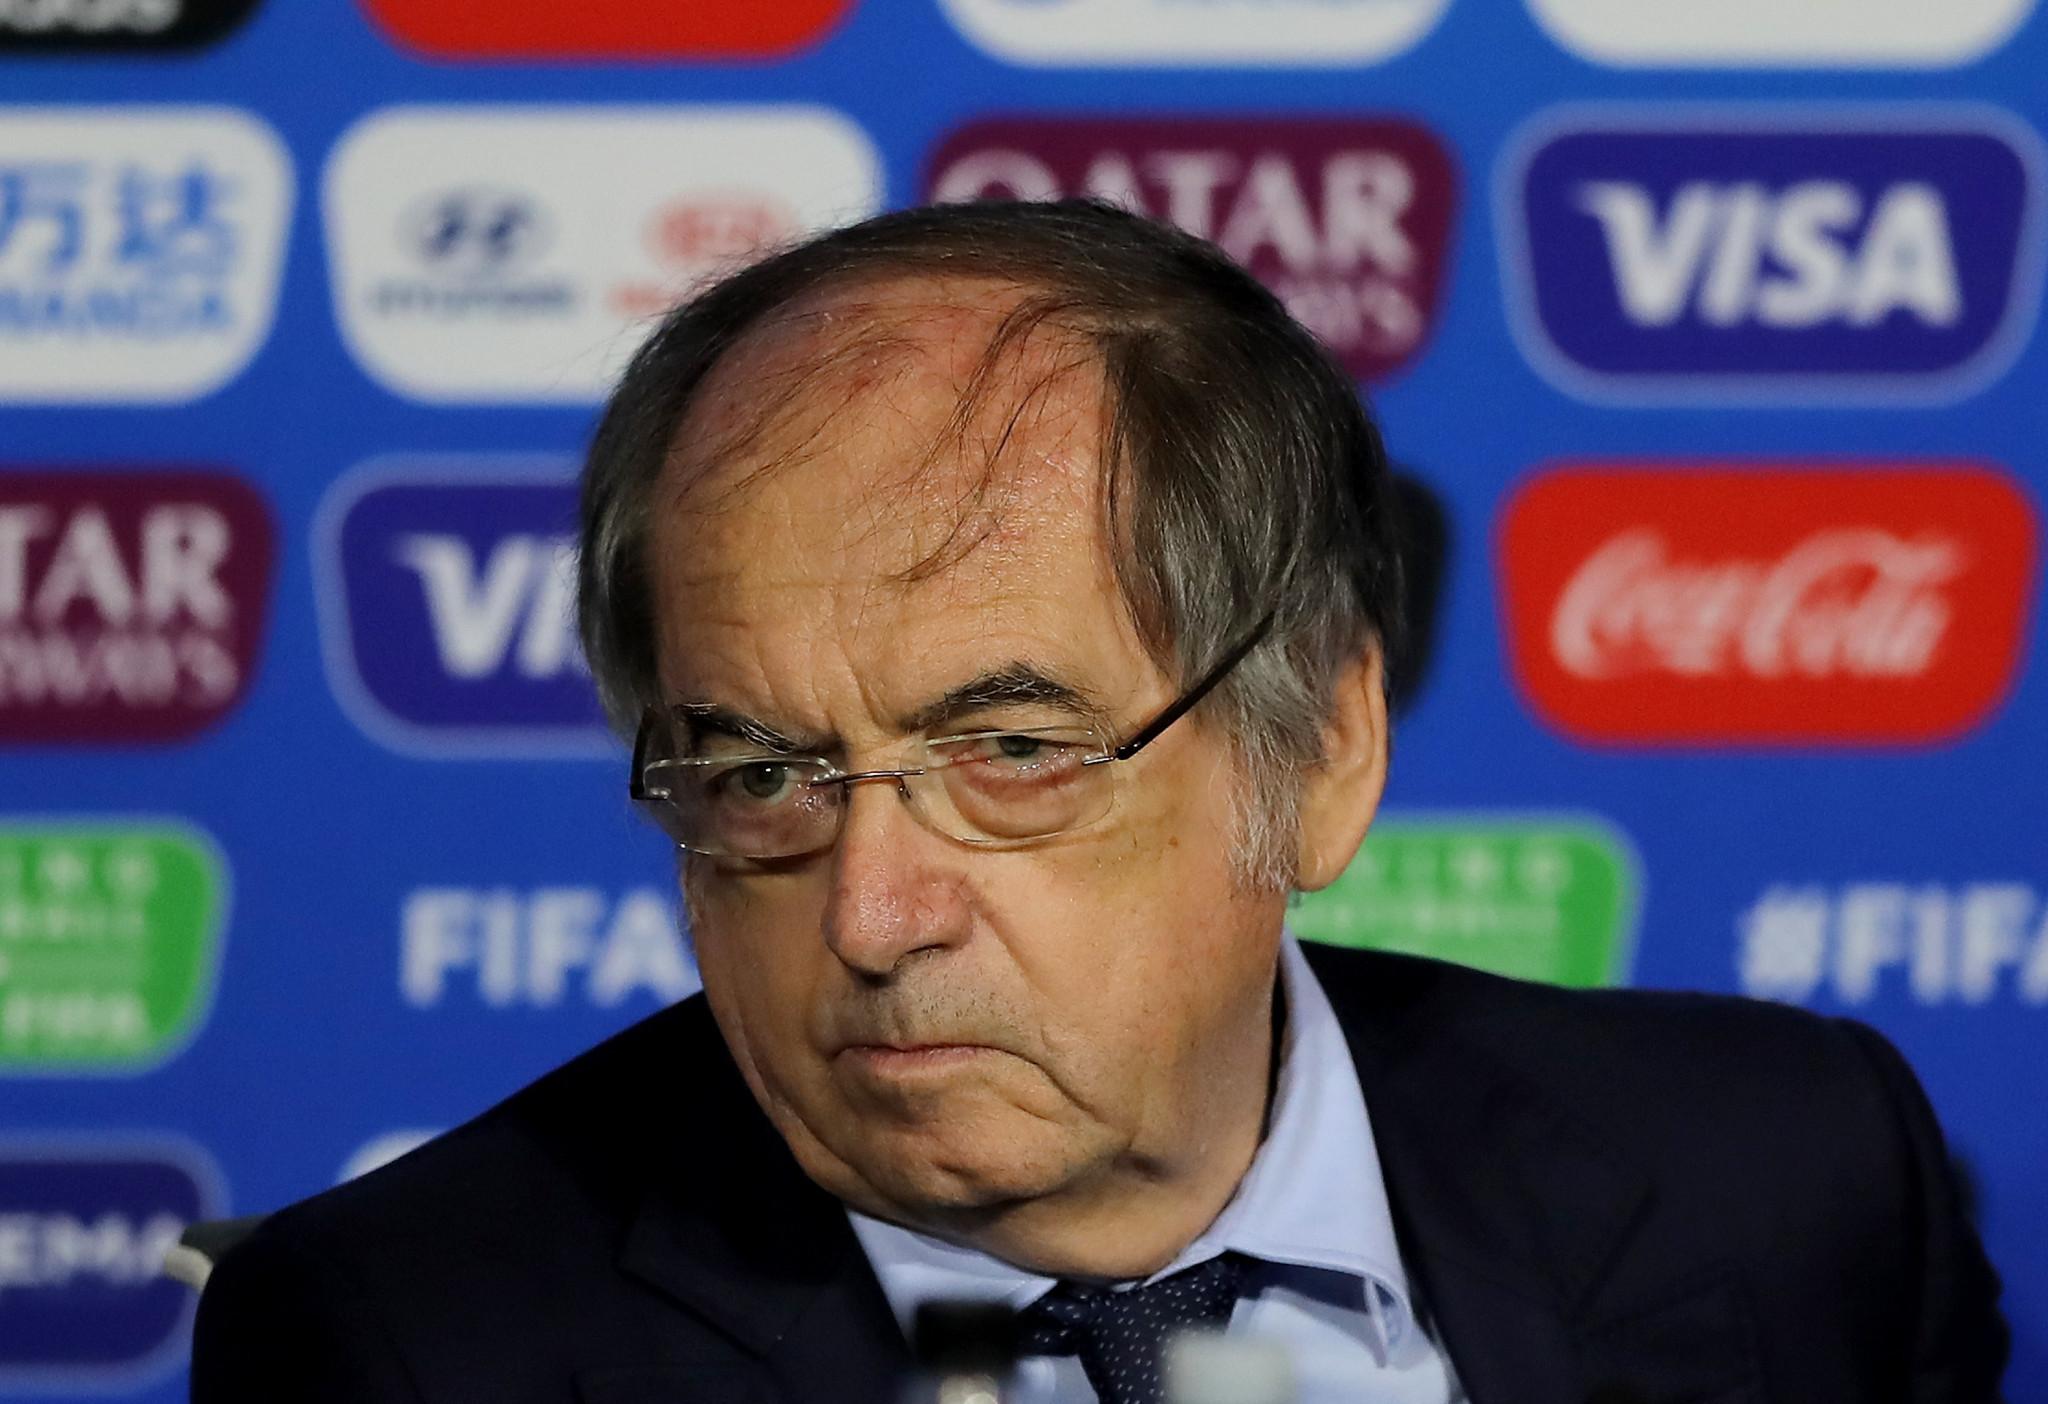 Le Graët and Koch set for FIFA and UEFA roles after Grindel resignations